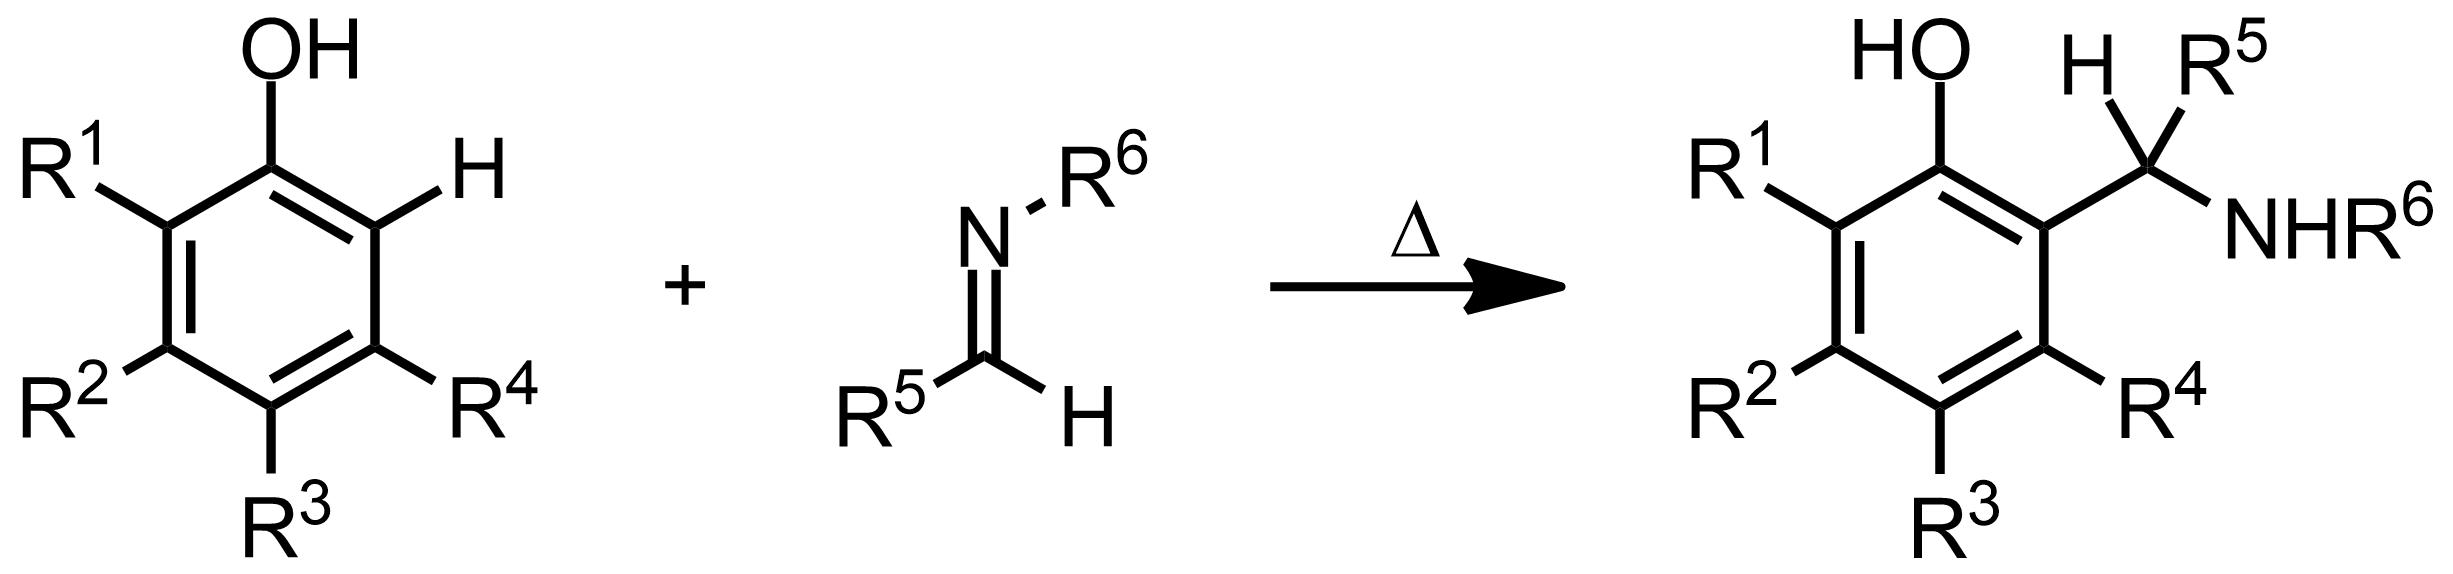 Schematic representation of the Betti Reaction.